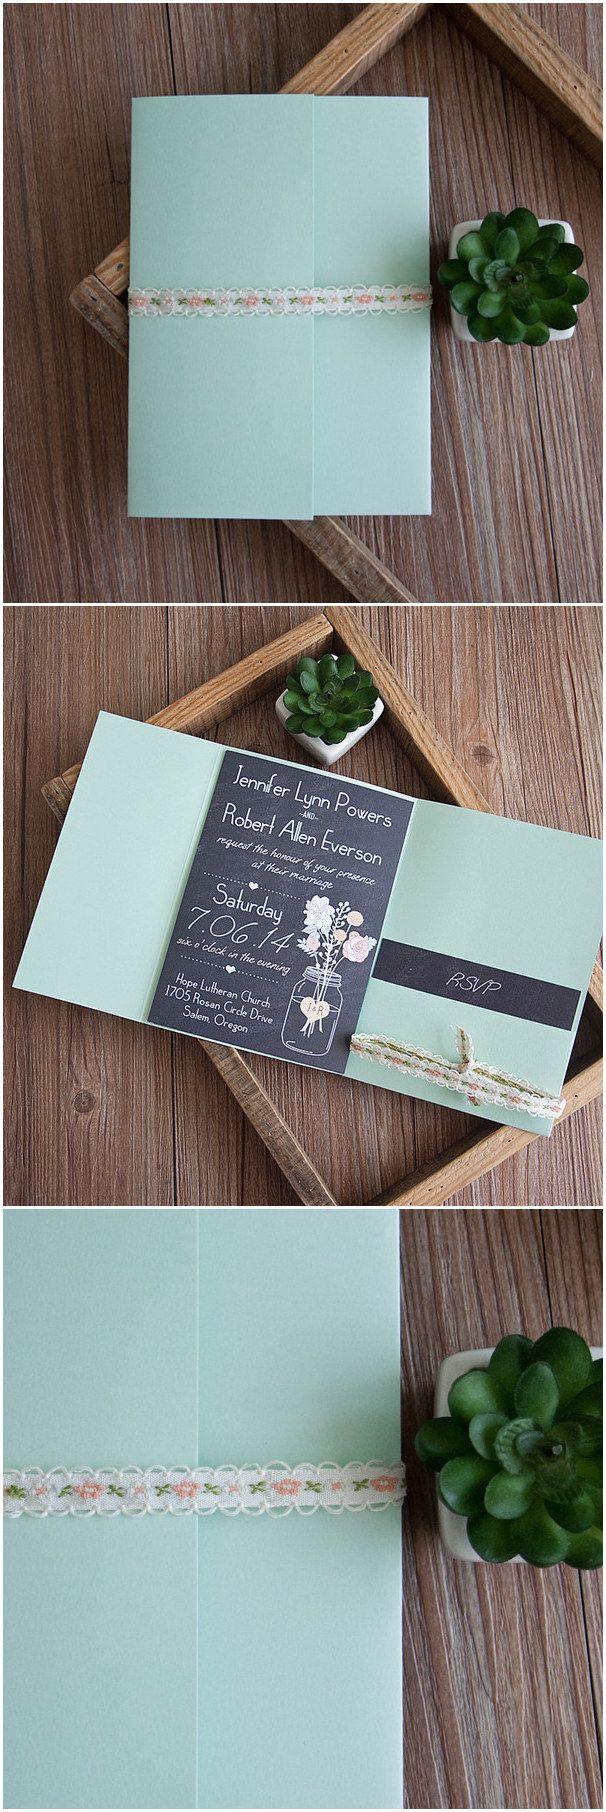 best 25 backyard wedding invitations ideas on pinterest barn